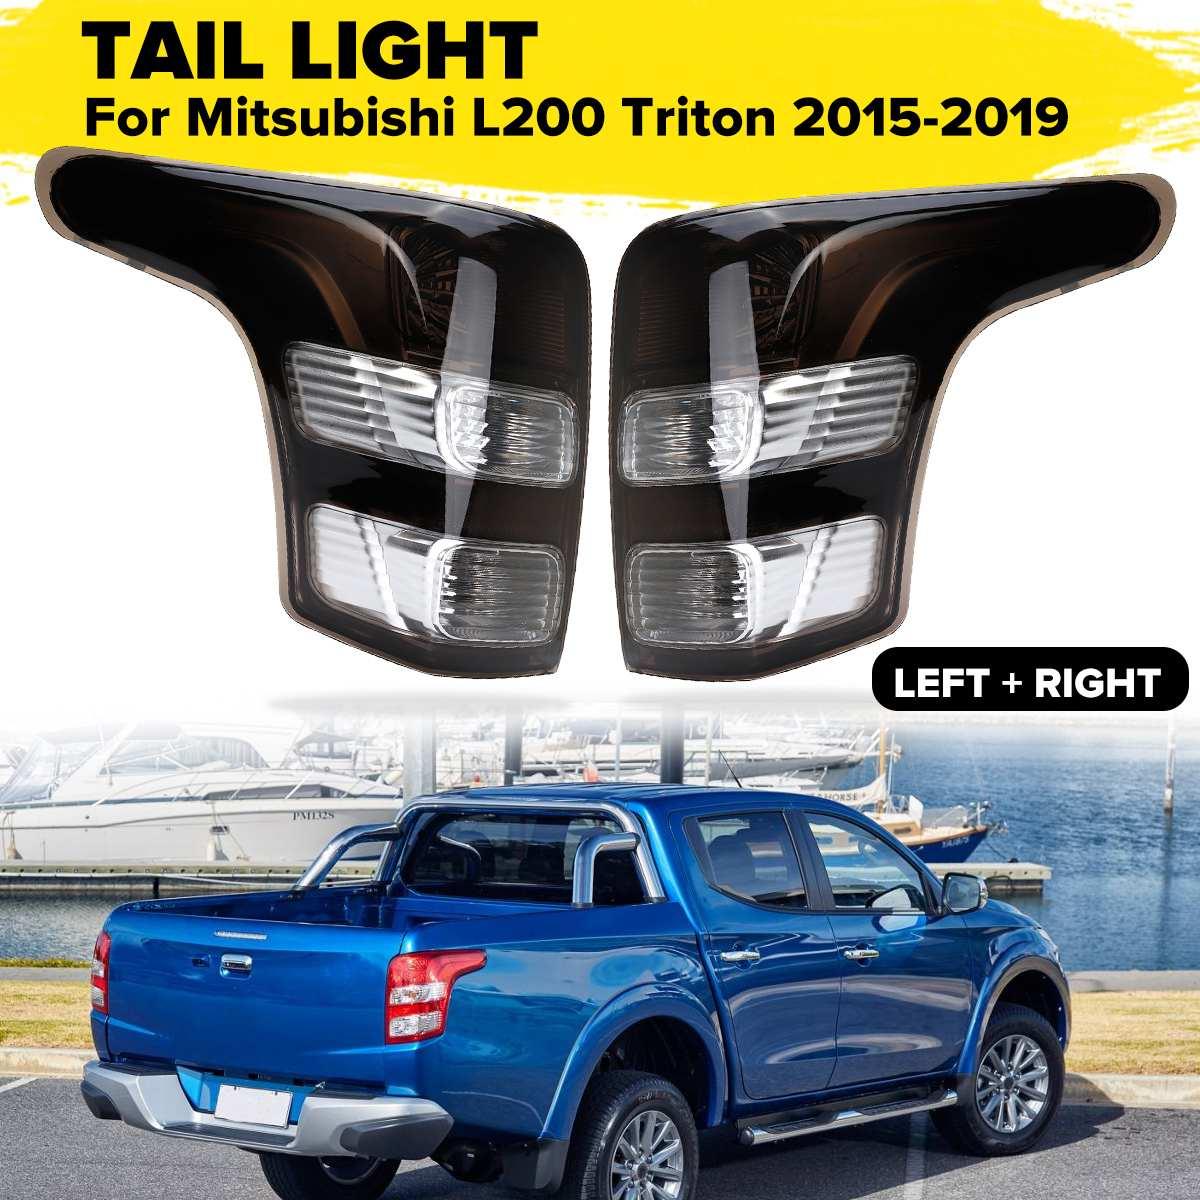 Black Left/Right Tail Light Lamp Right Side for Fiat for Strada for Mitsubishi for Triton L200 2015 2016 2017 2018+  no harnessBlack Left/Right Tail Light Lamp Right Side for Fiat for Strada for Mitsubishi for Triton L200 2015 2016 2017 2018+  no harness